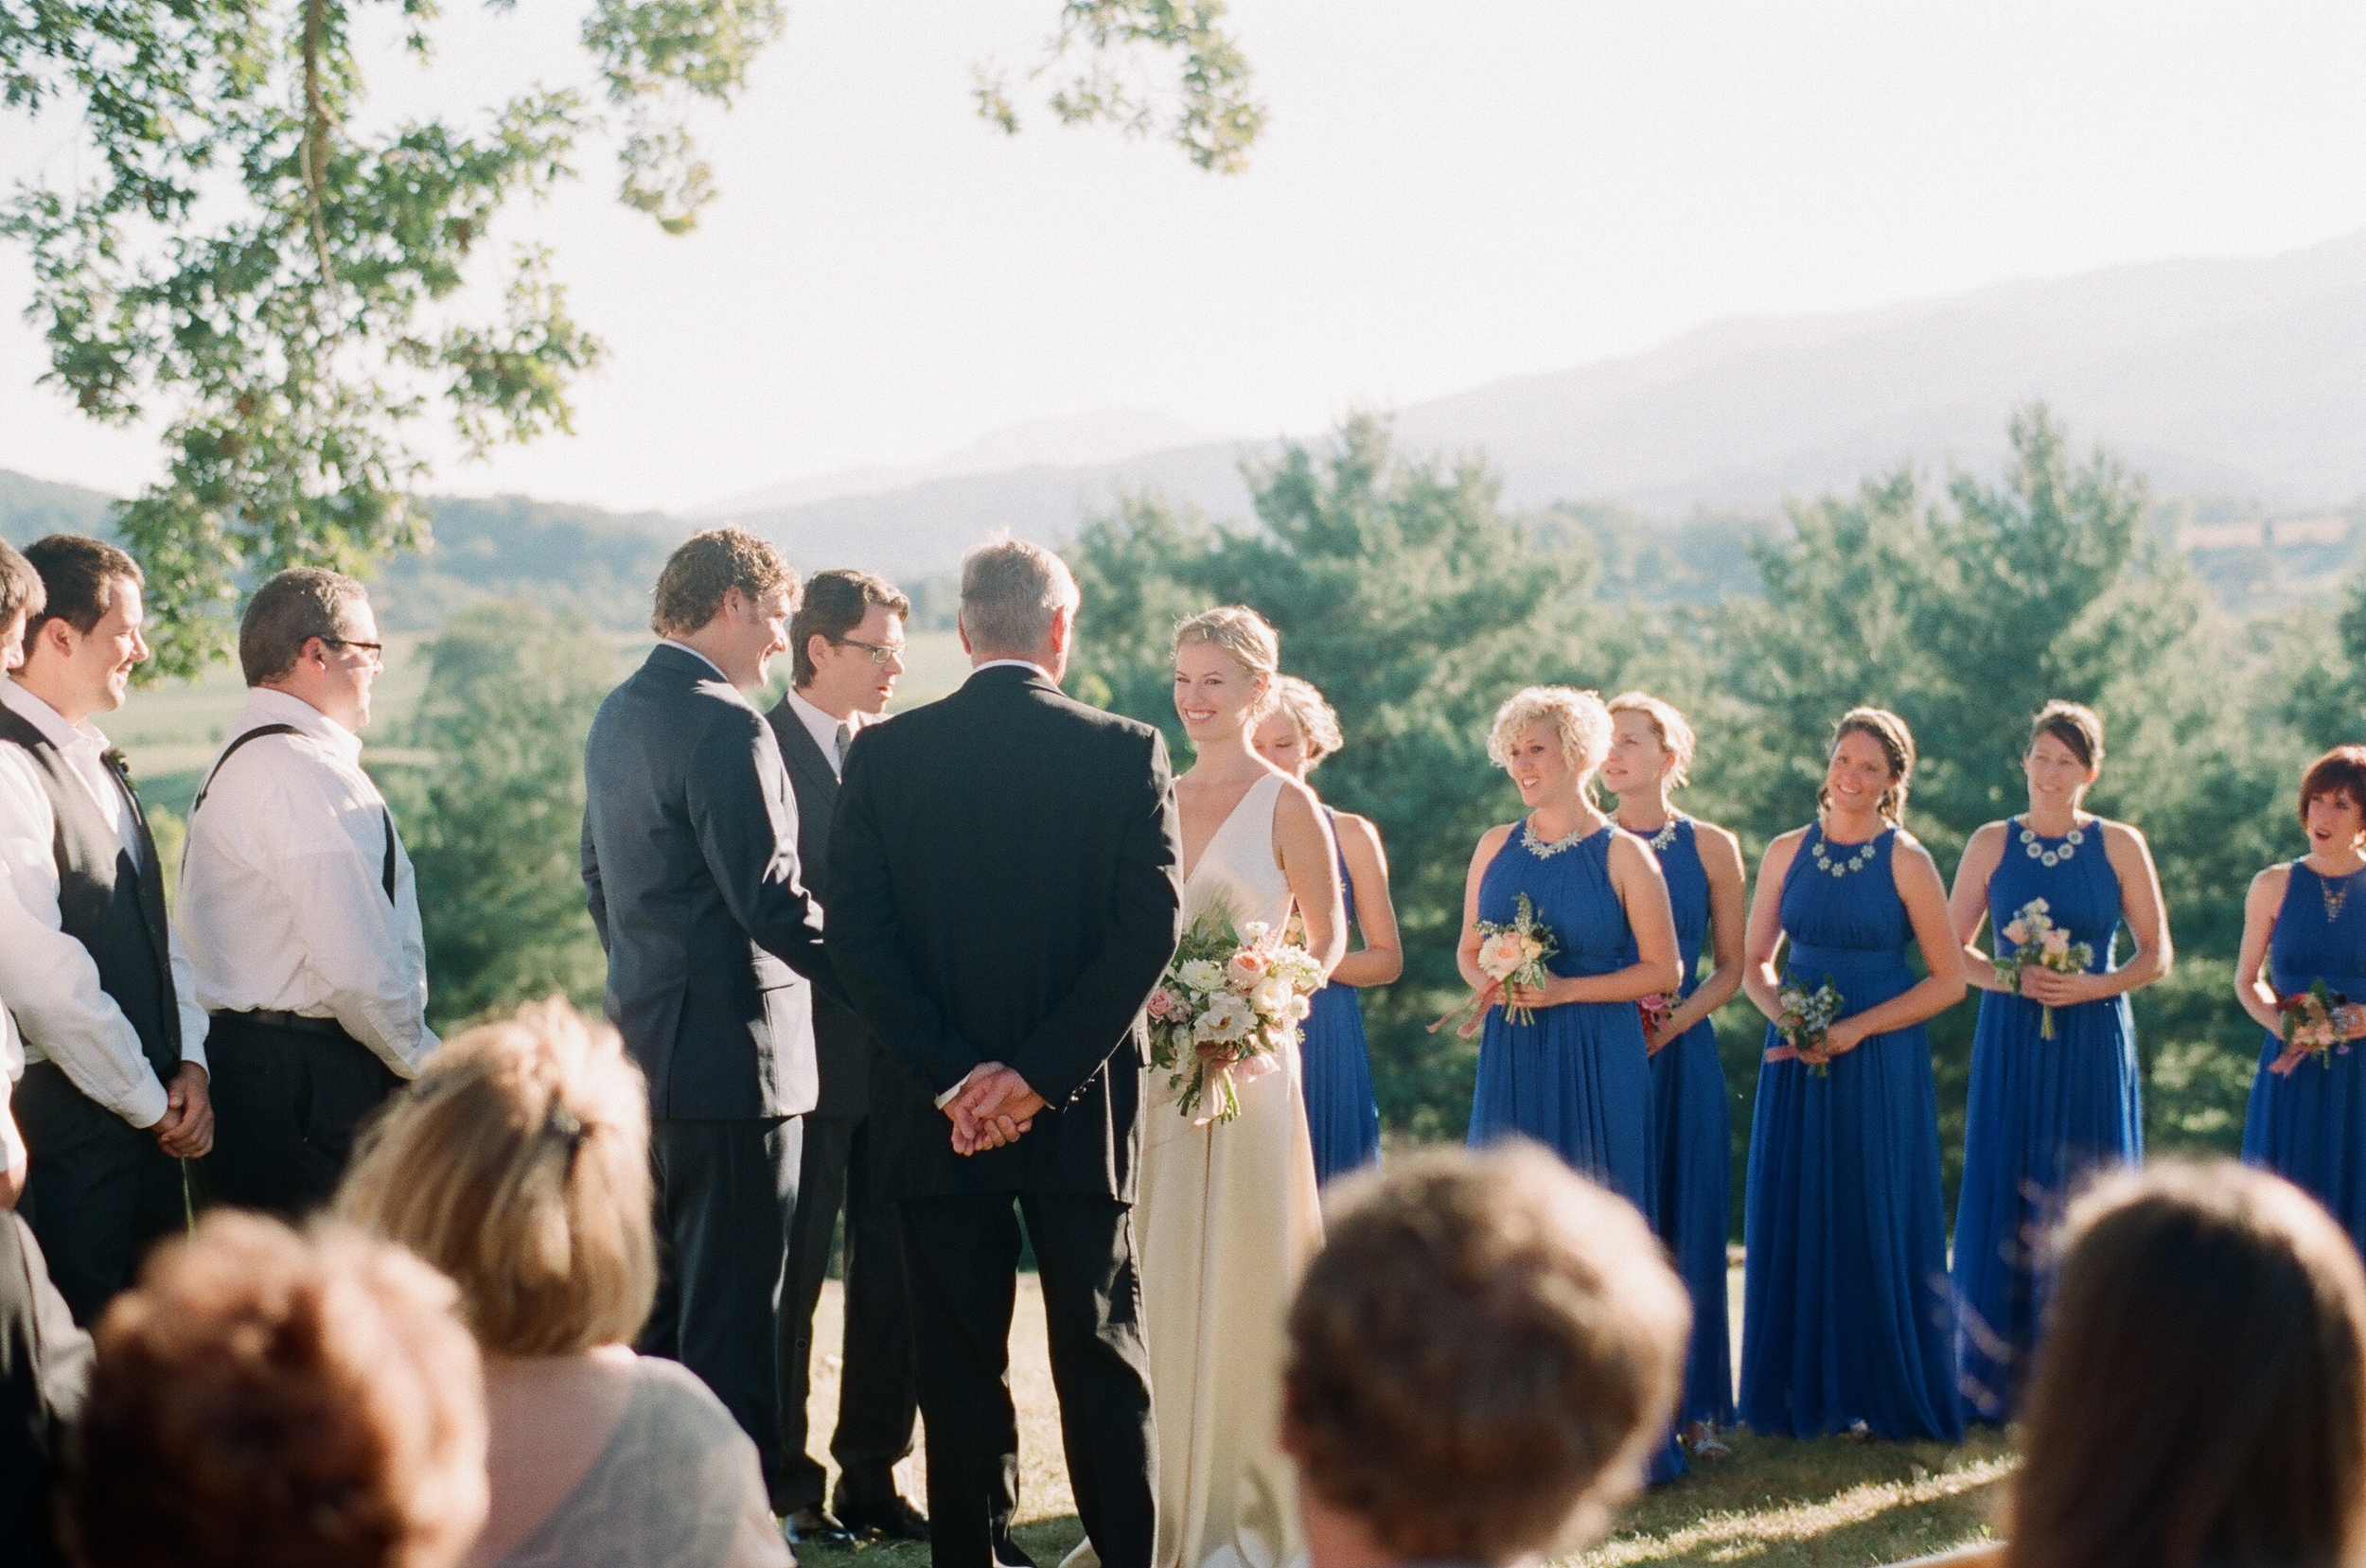 Boston wedding celebrant